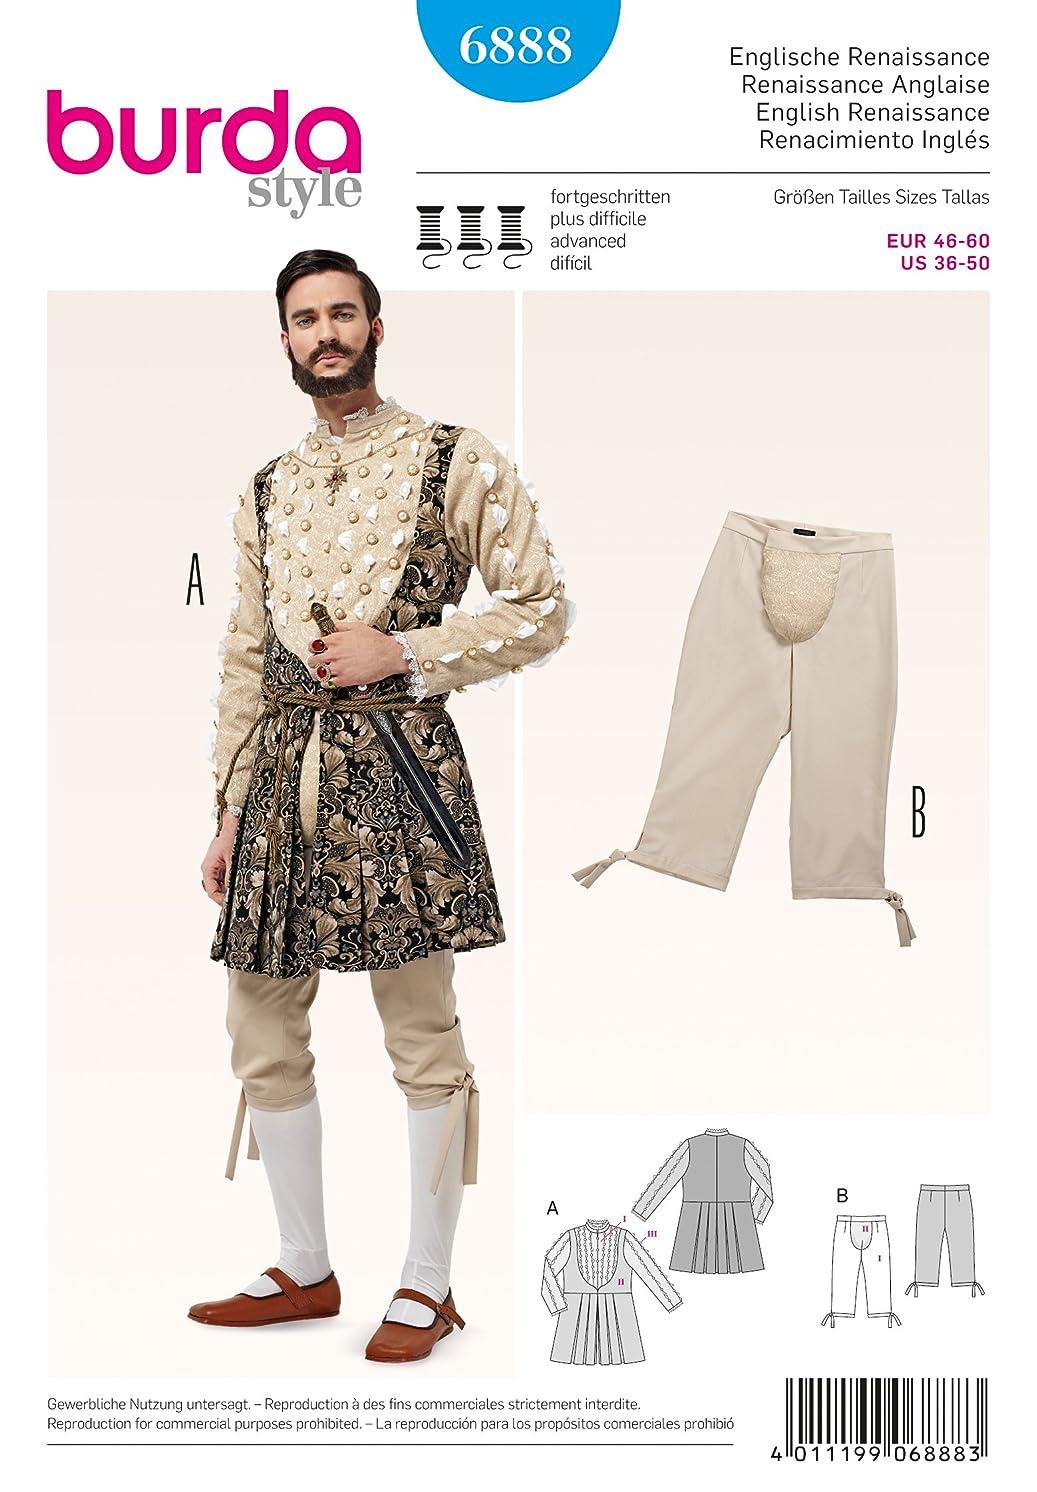 6888 Burda Mens English Renaissance Costume Sewing Pattern Sizes 36-50